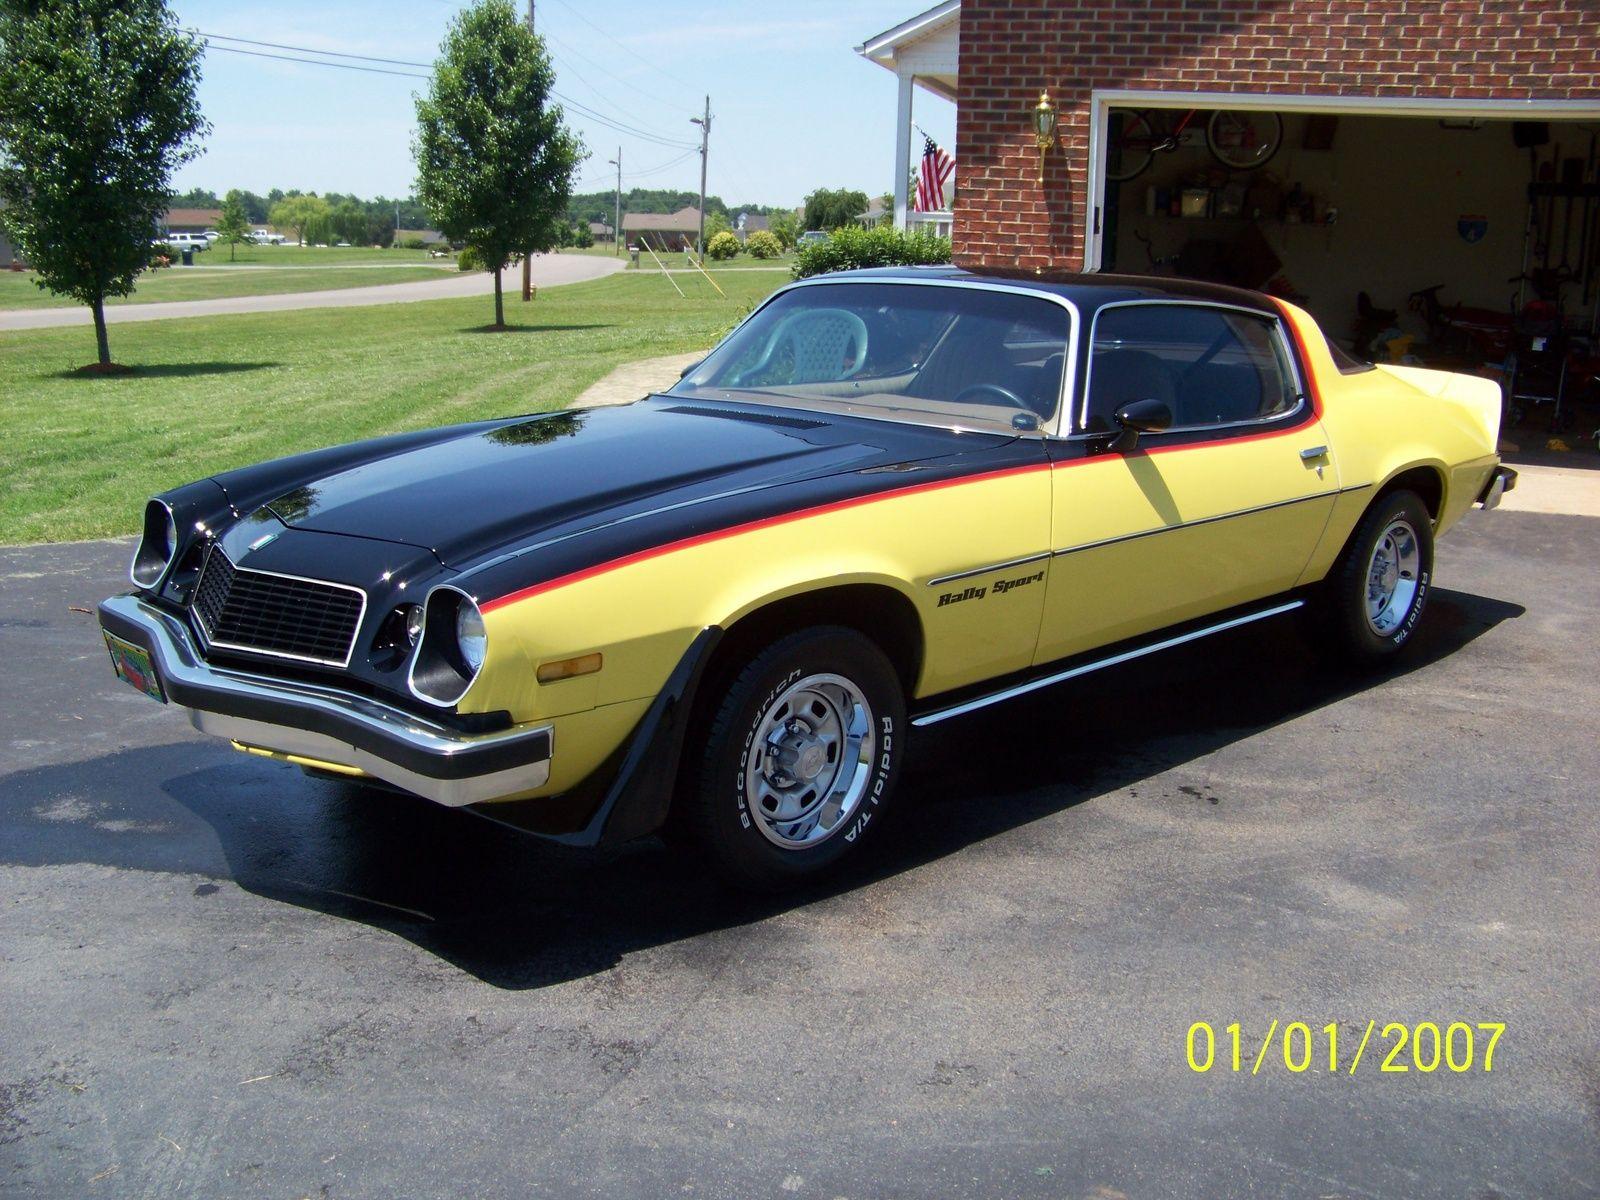 hight resolution of 1976 camaro picture of 1976 chevrolet camaro exterior